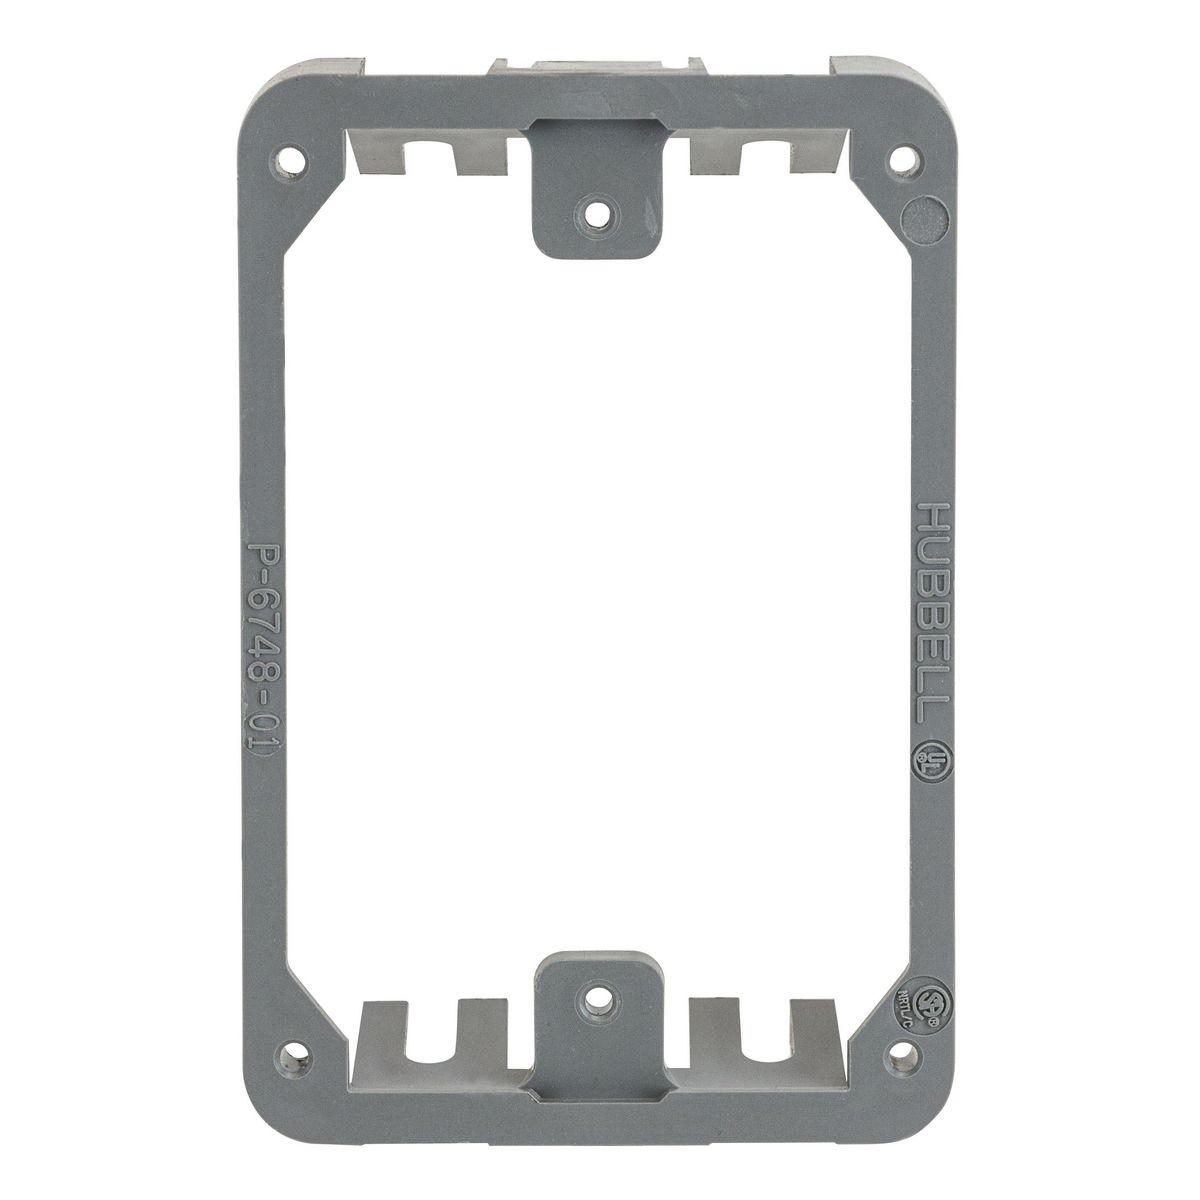 Hubbell PFBRMC Non-Metallic Concrete Floor Box Mounting Collar